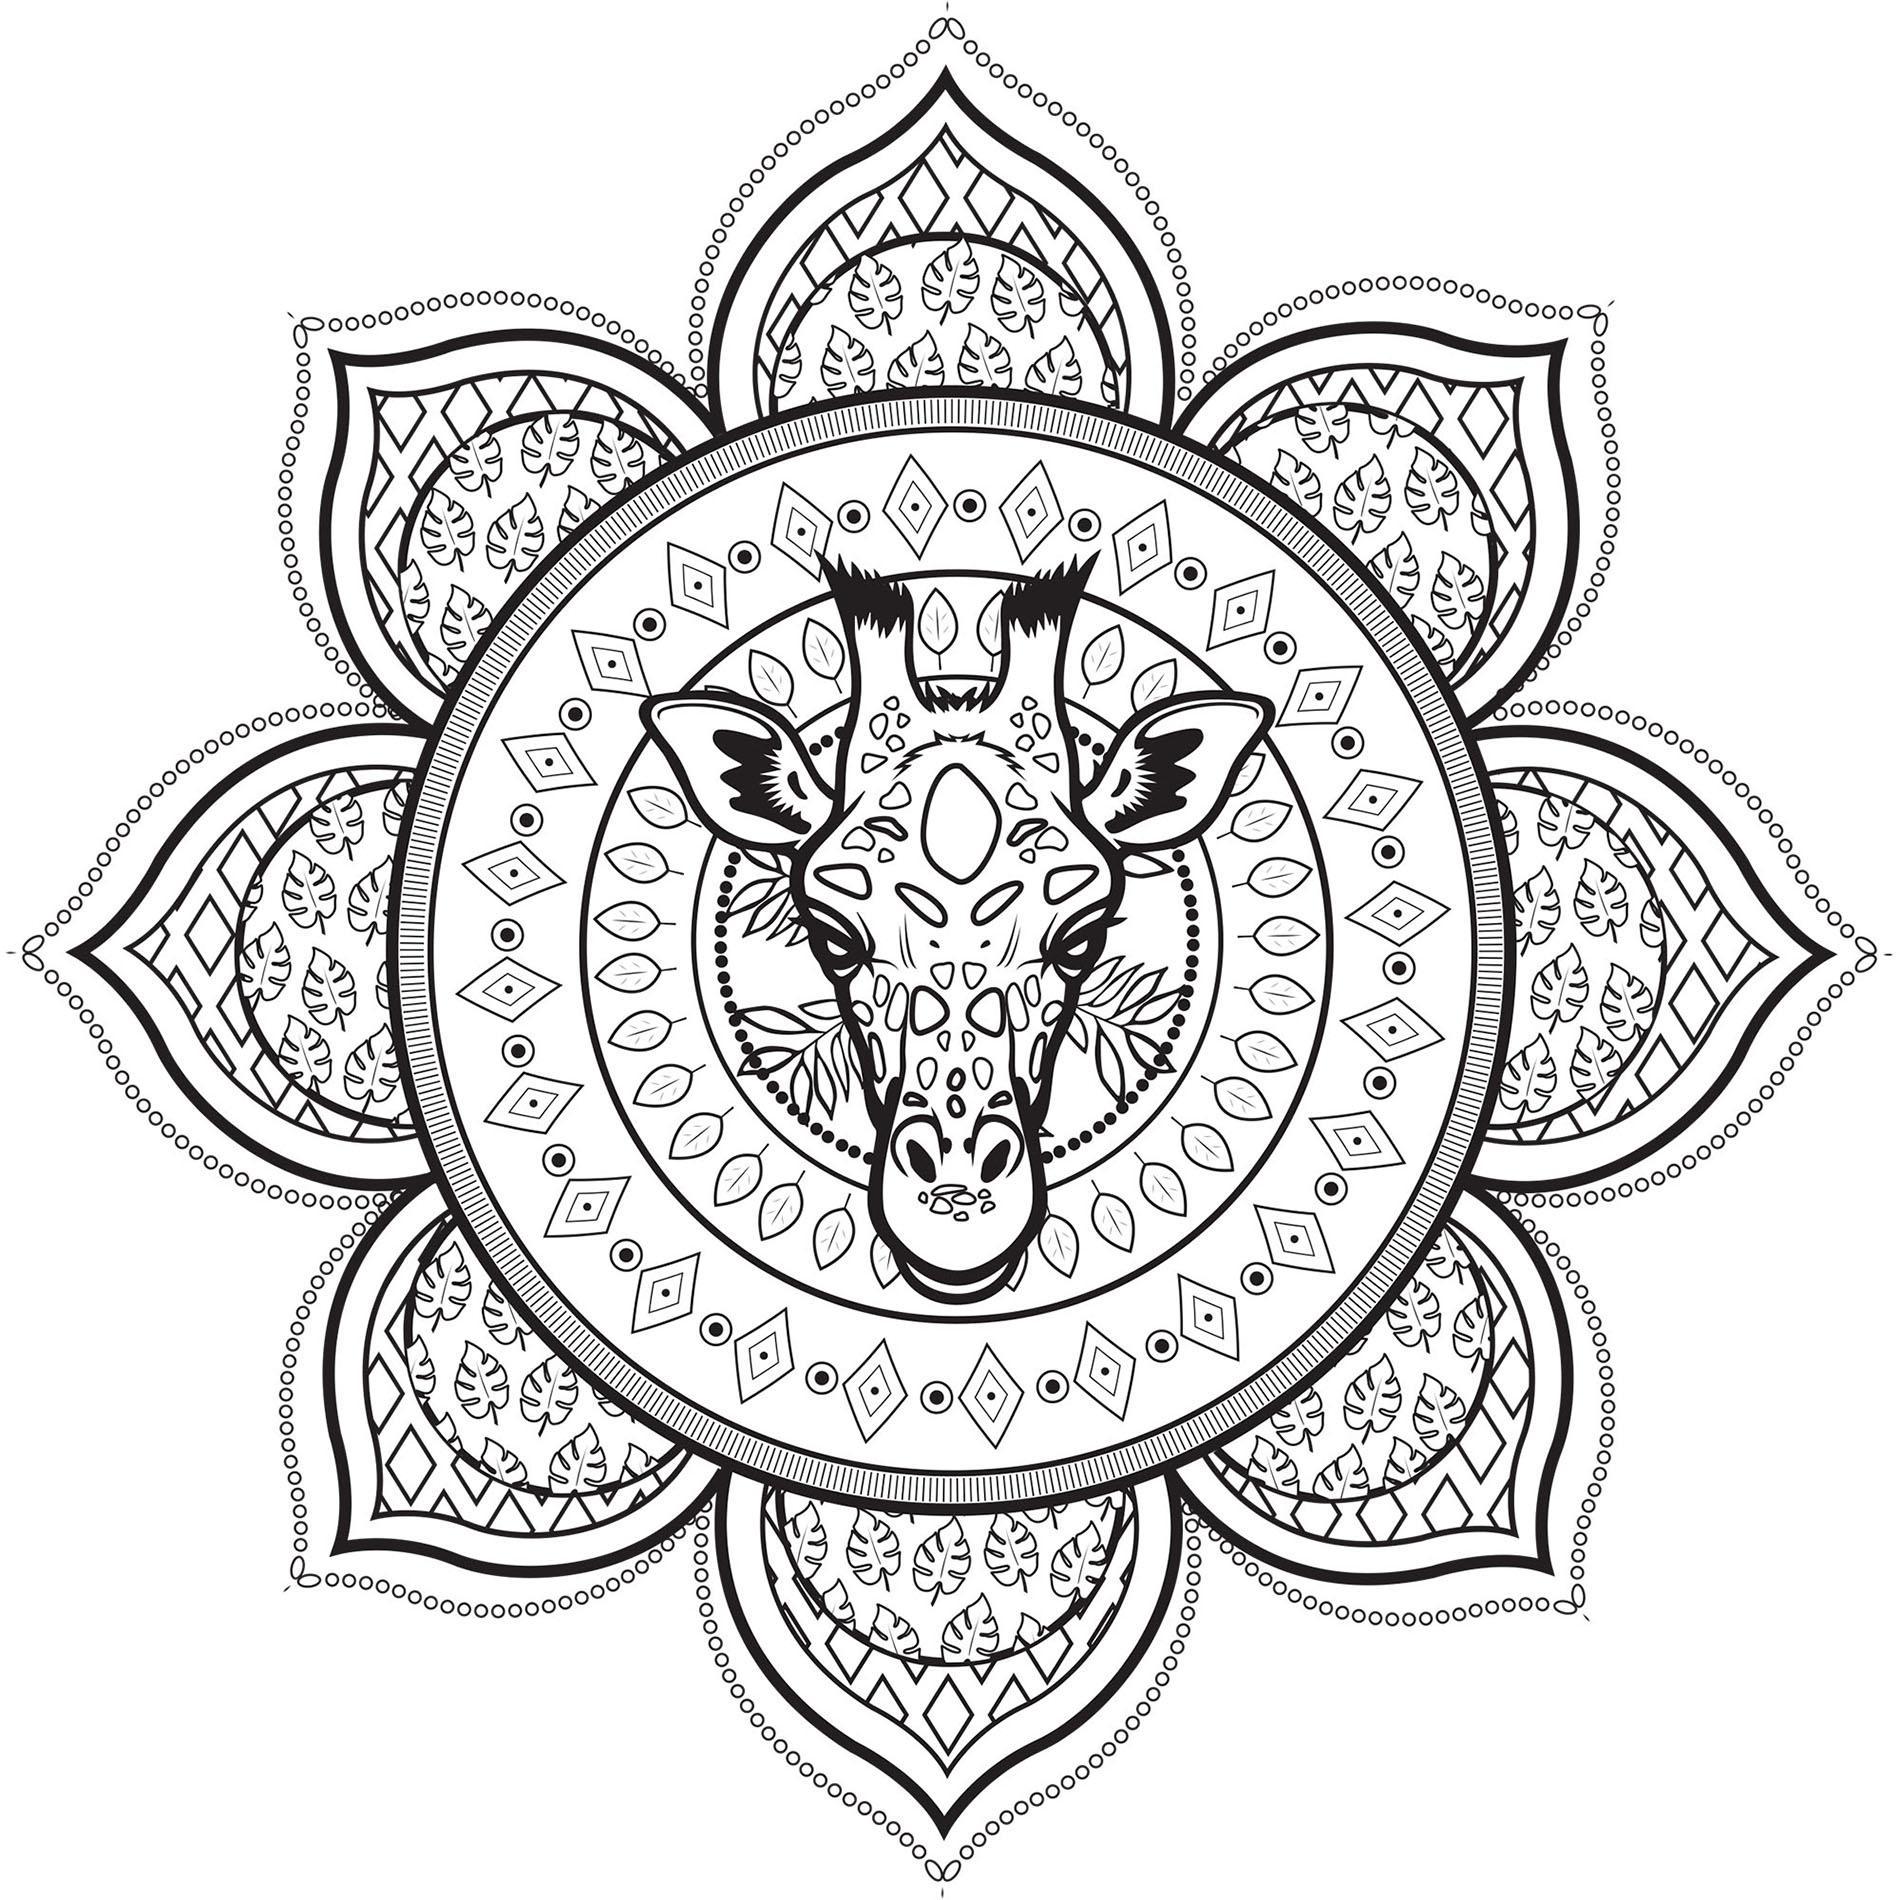 Coloriage Girafe Mandala.Mandala Complexe Avec Tete De Giraffe Mandalas Difficiles